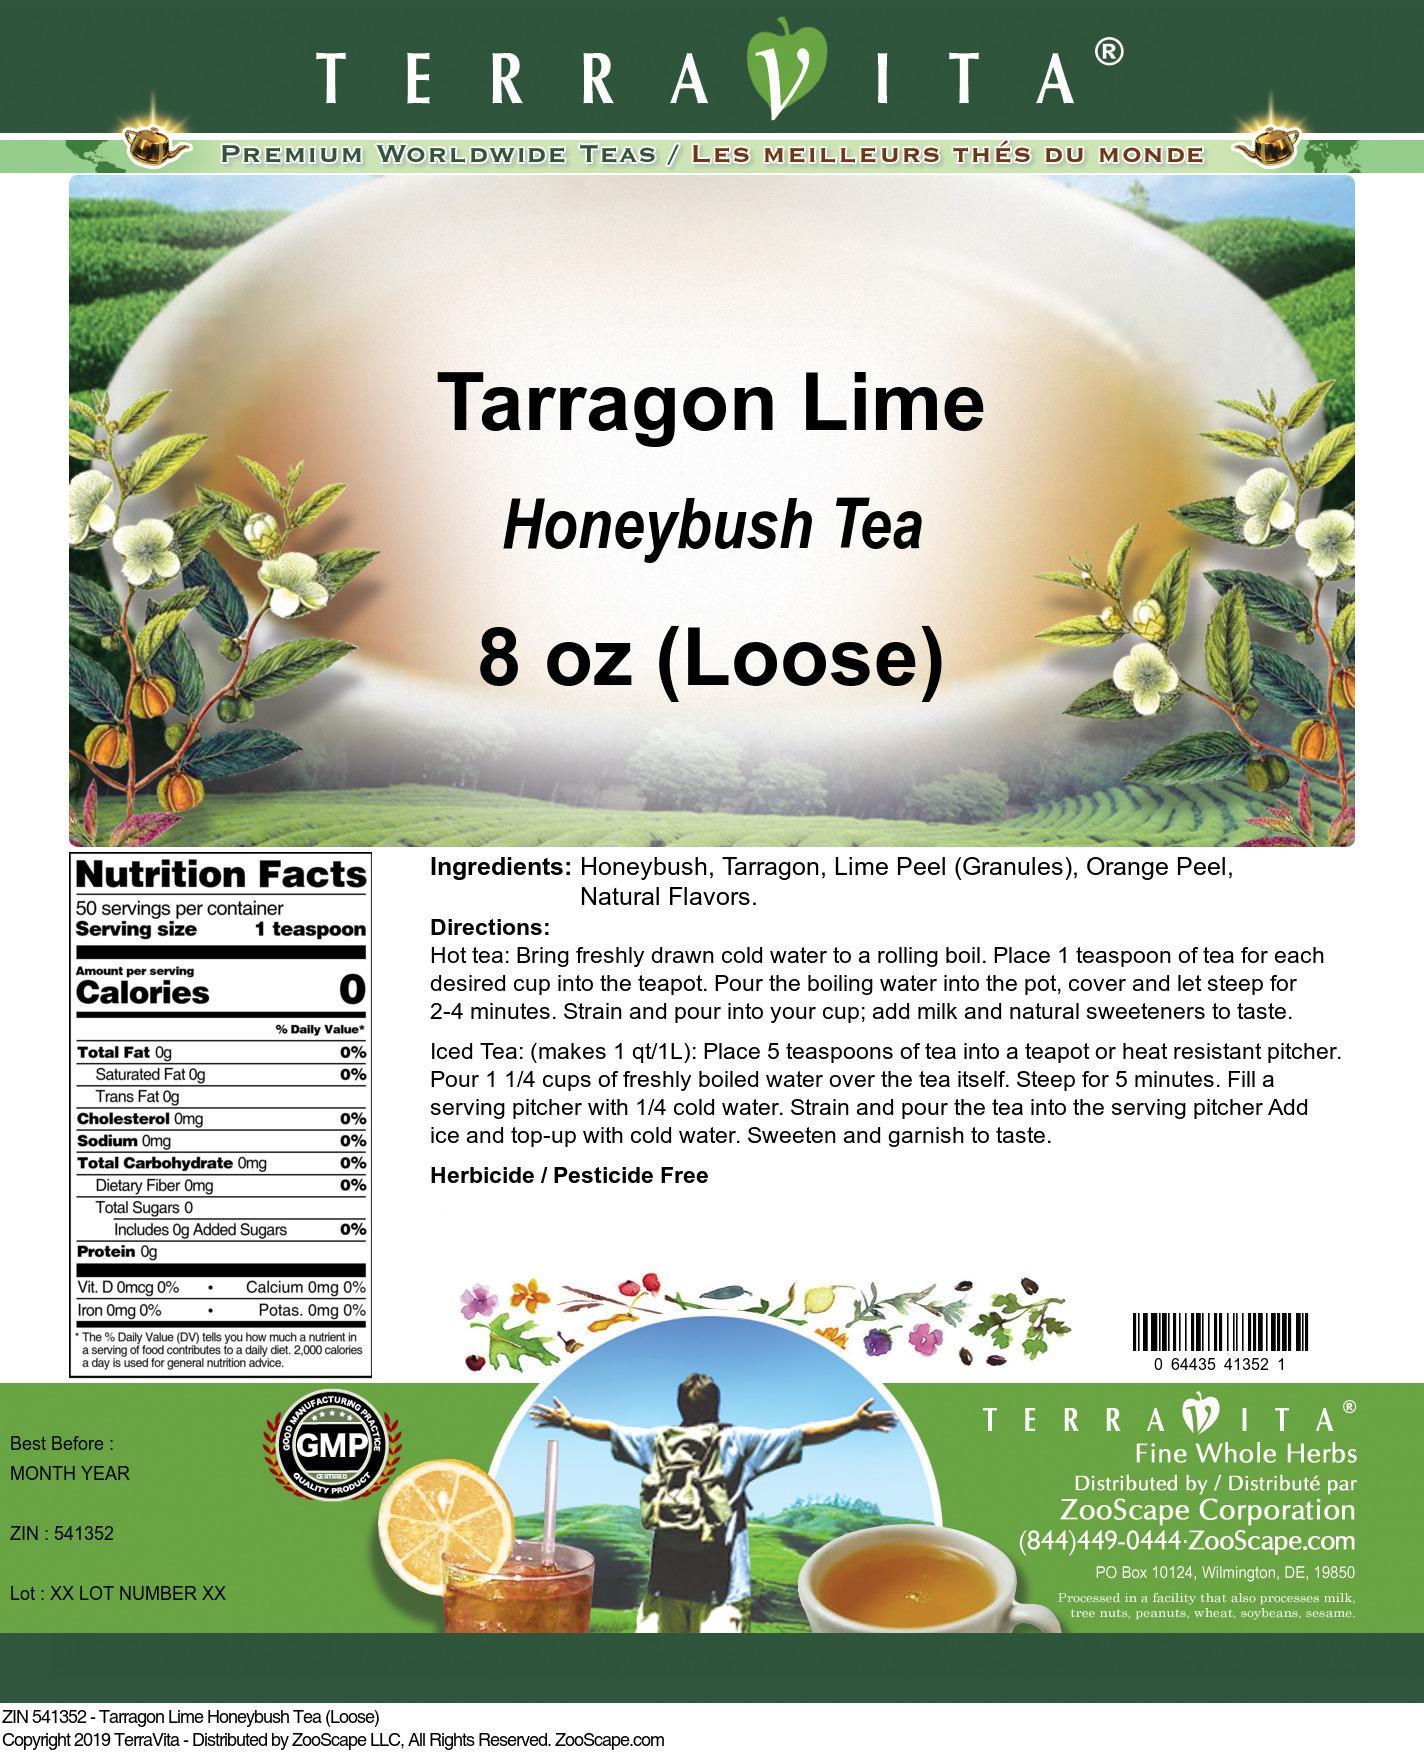 Tarragon Lime Honeybush Tea